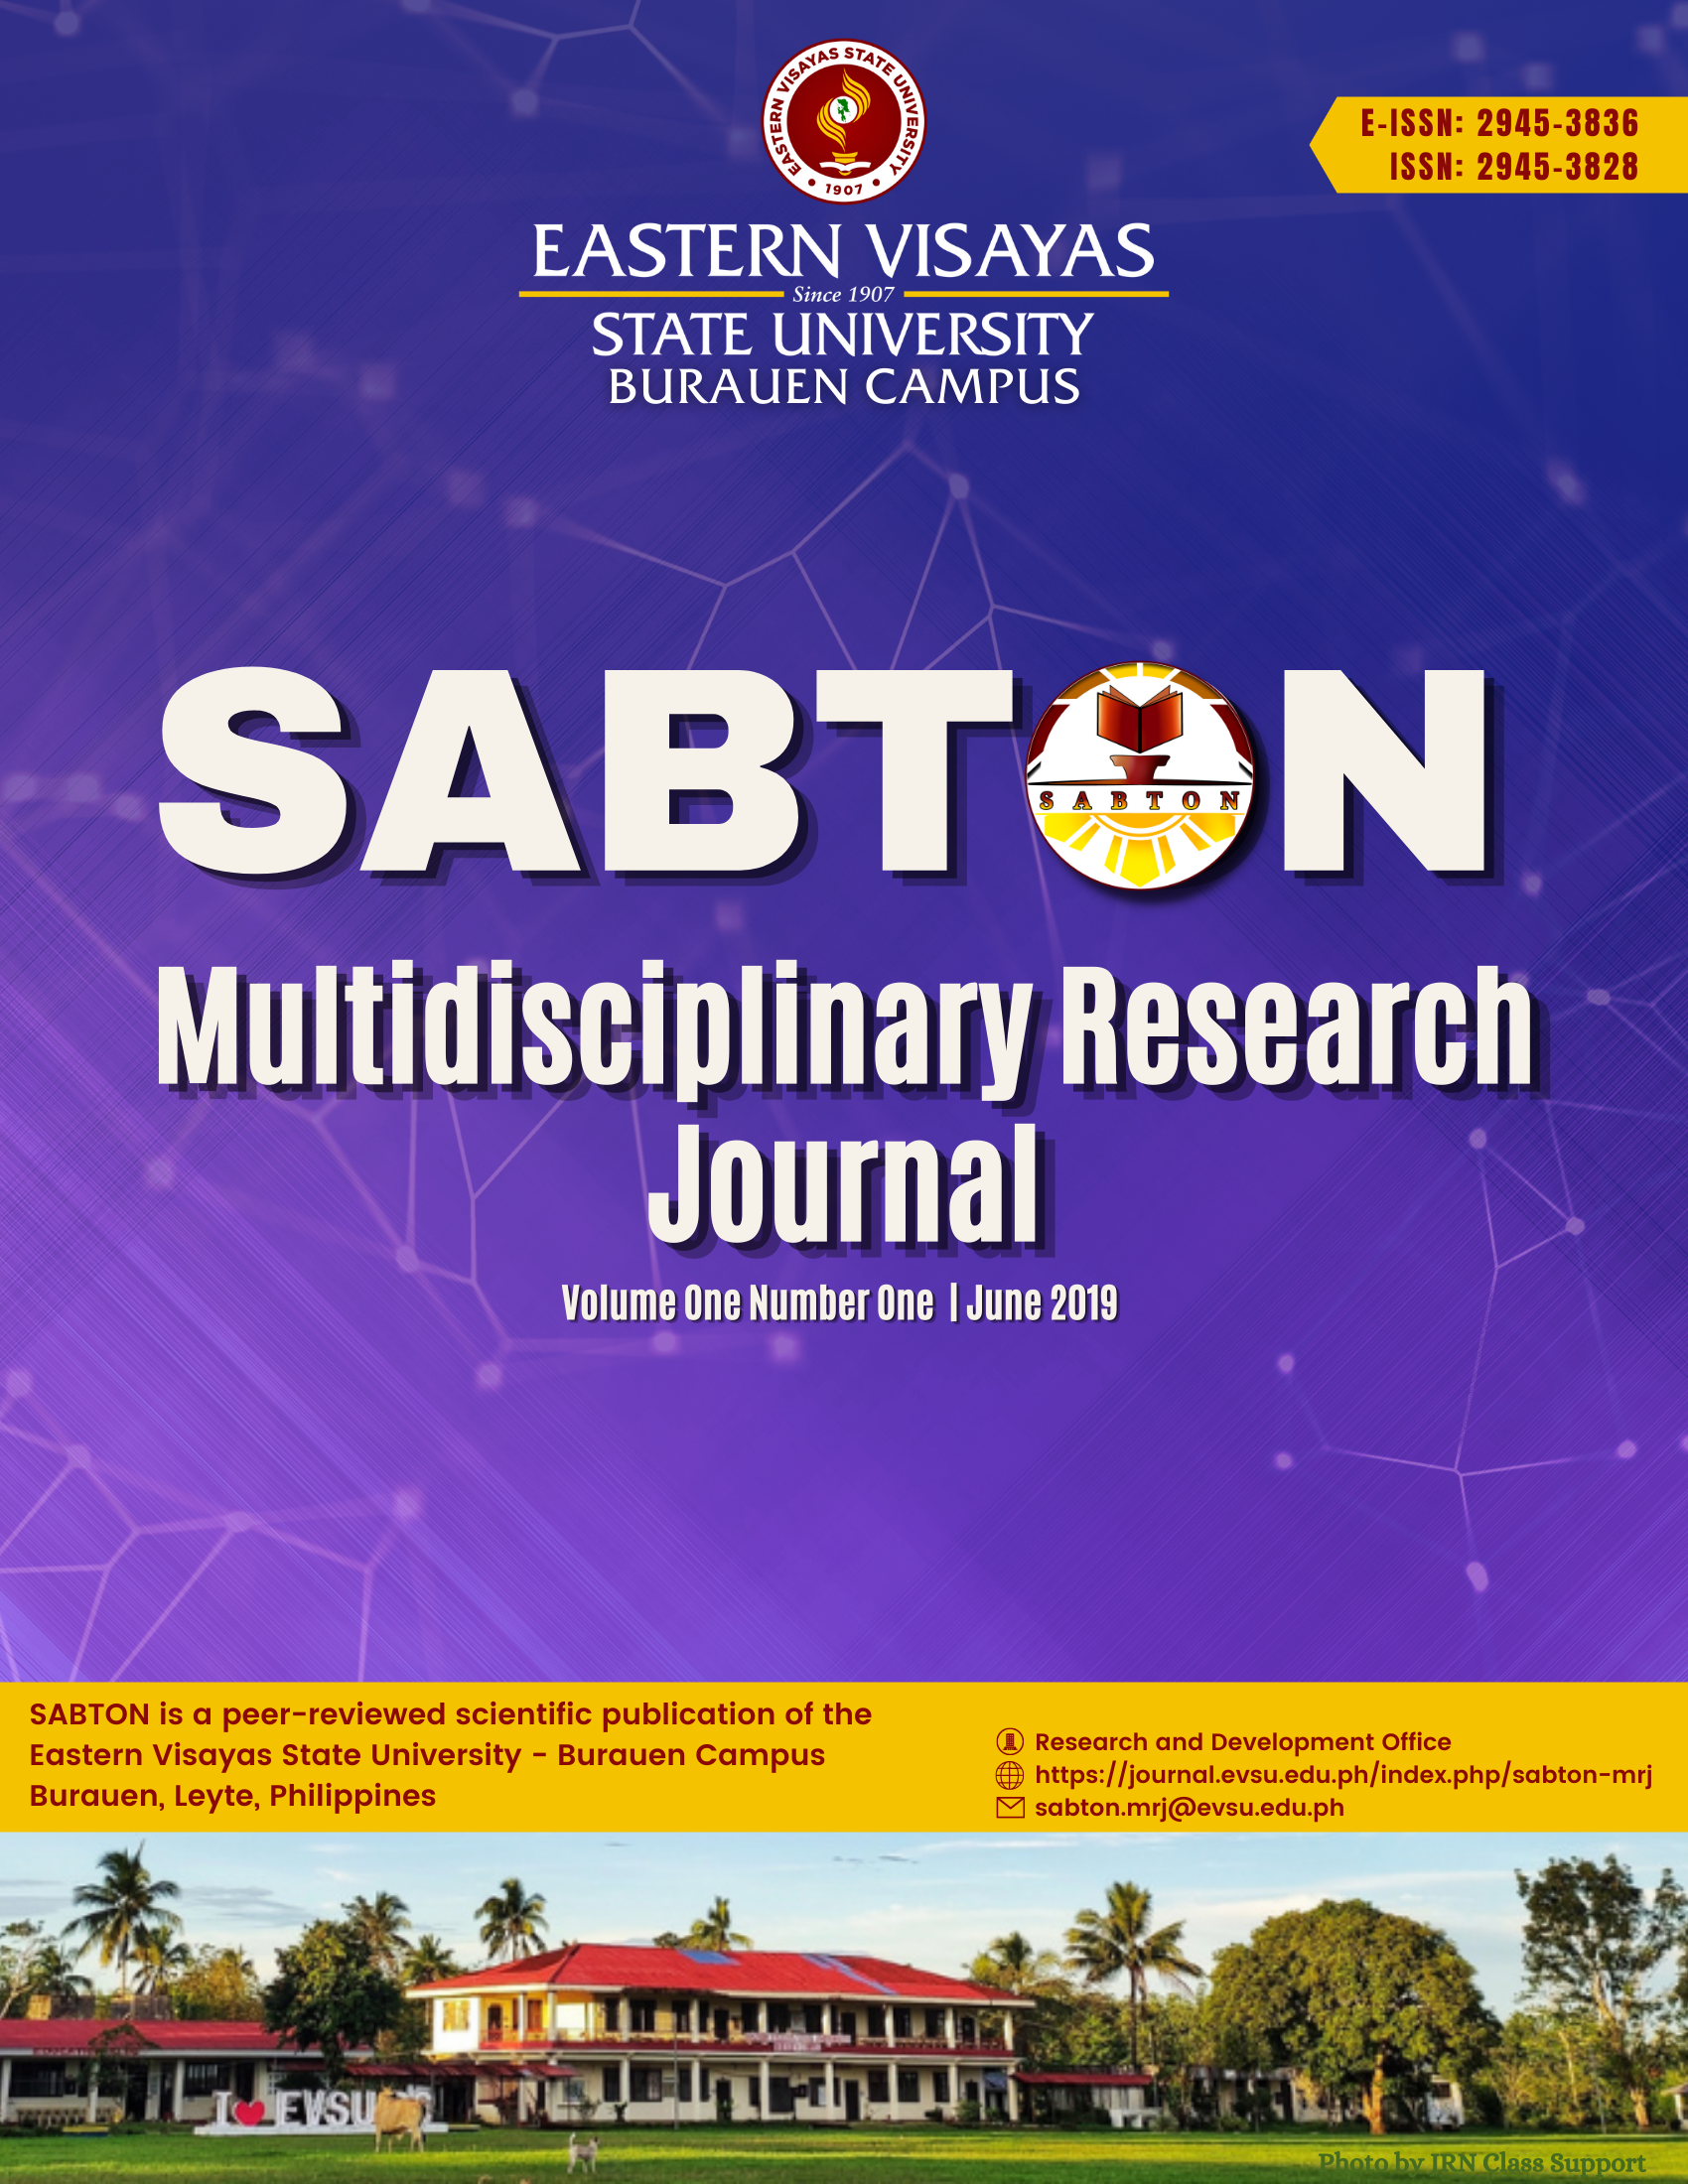 SABTON: Multidisciplinary Research Journal (SABTON-MRJ)